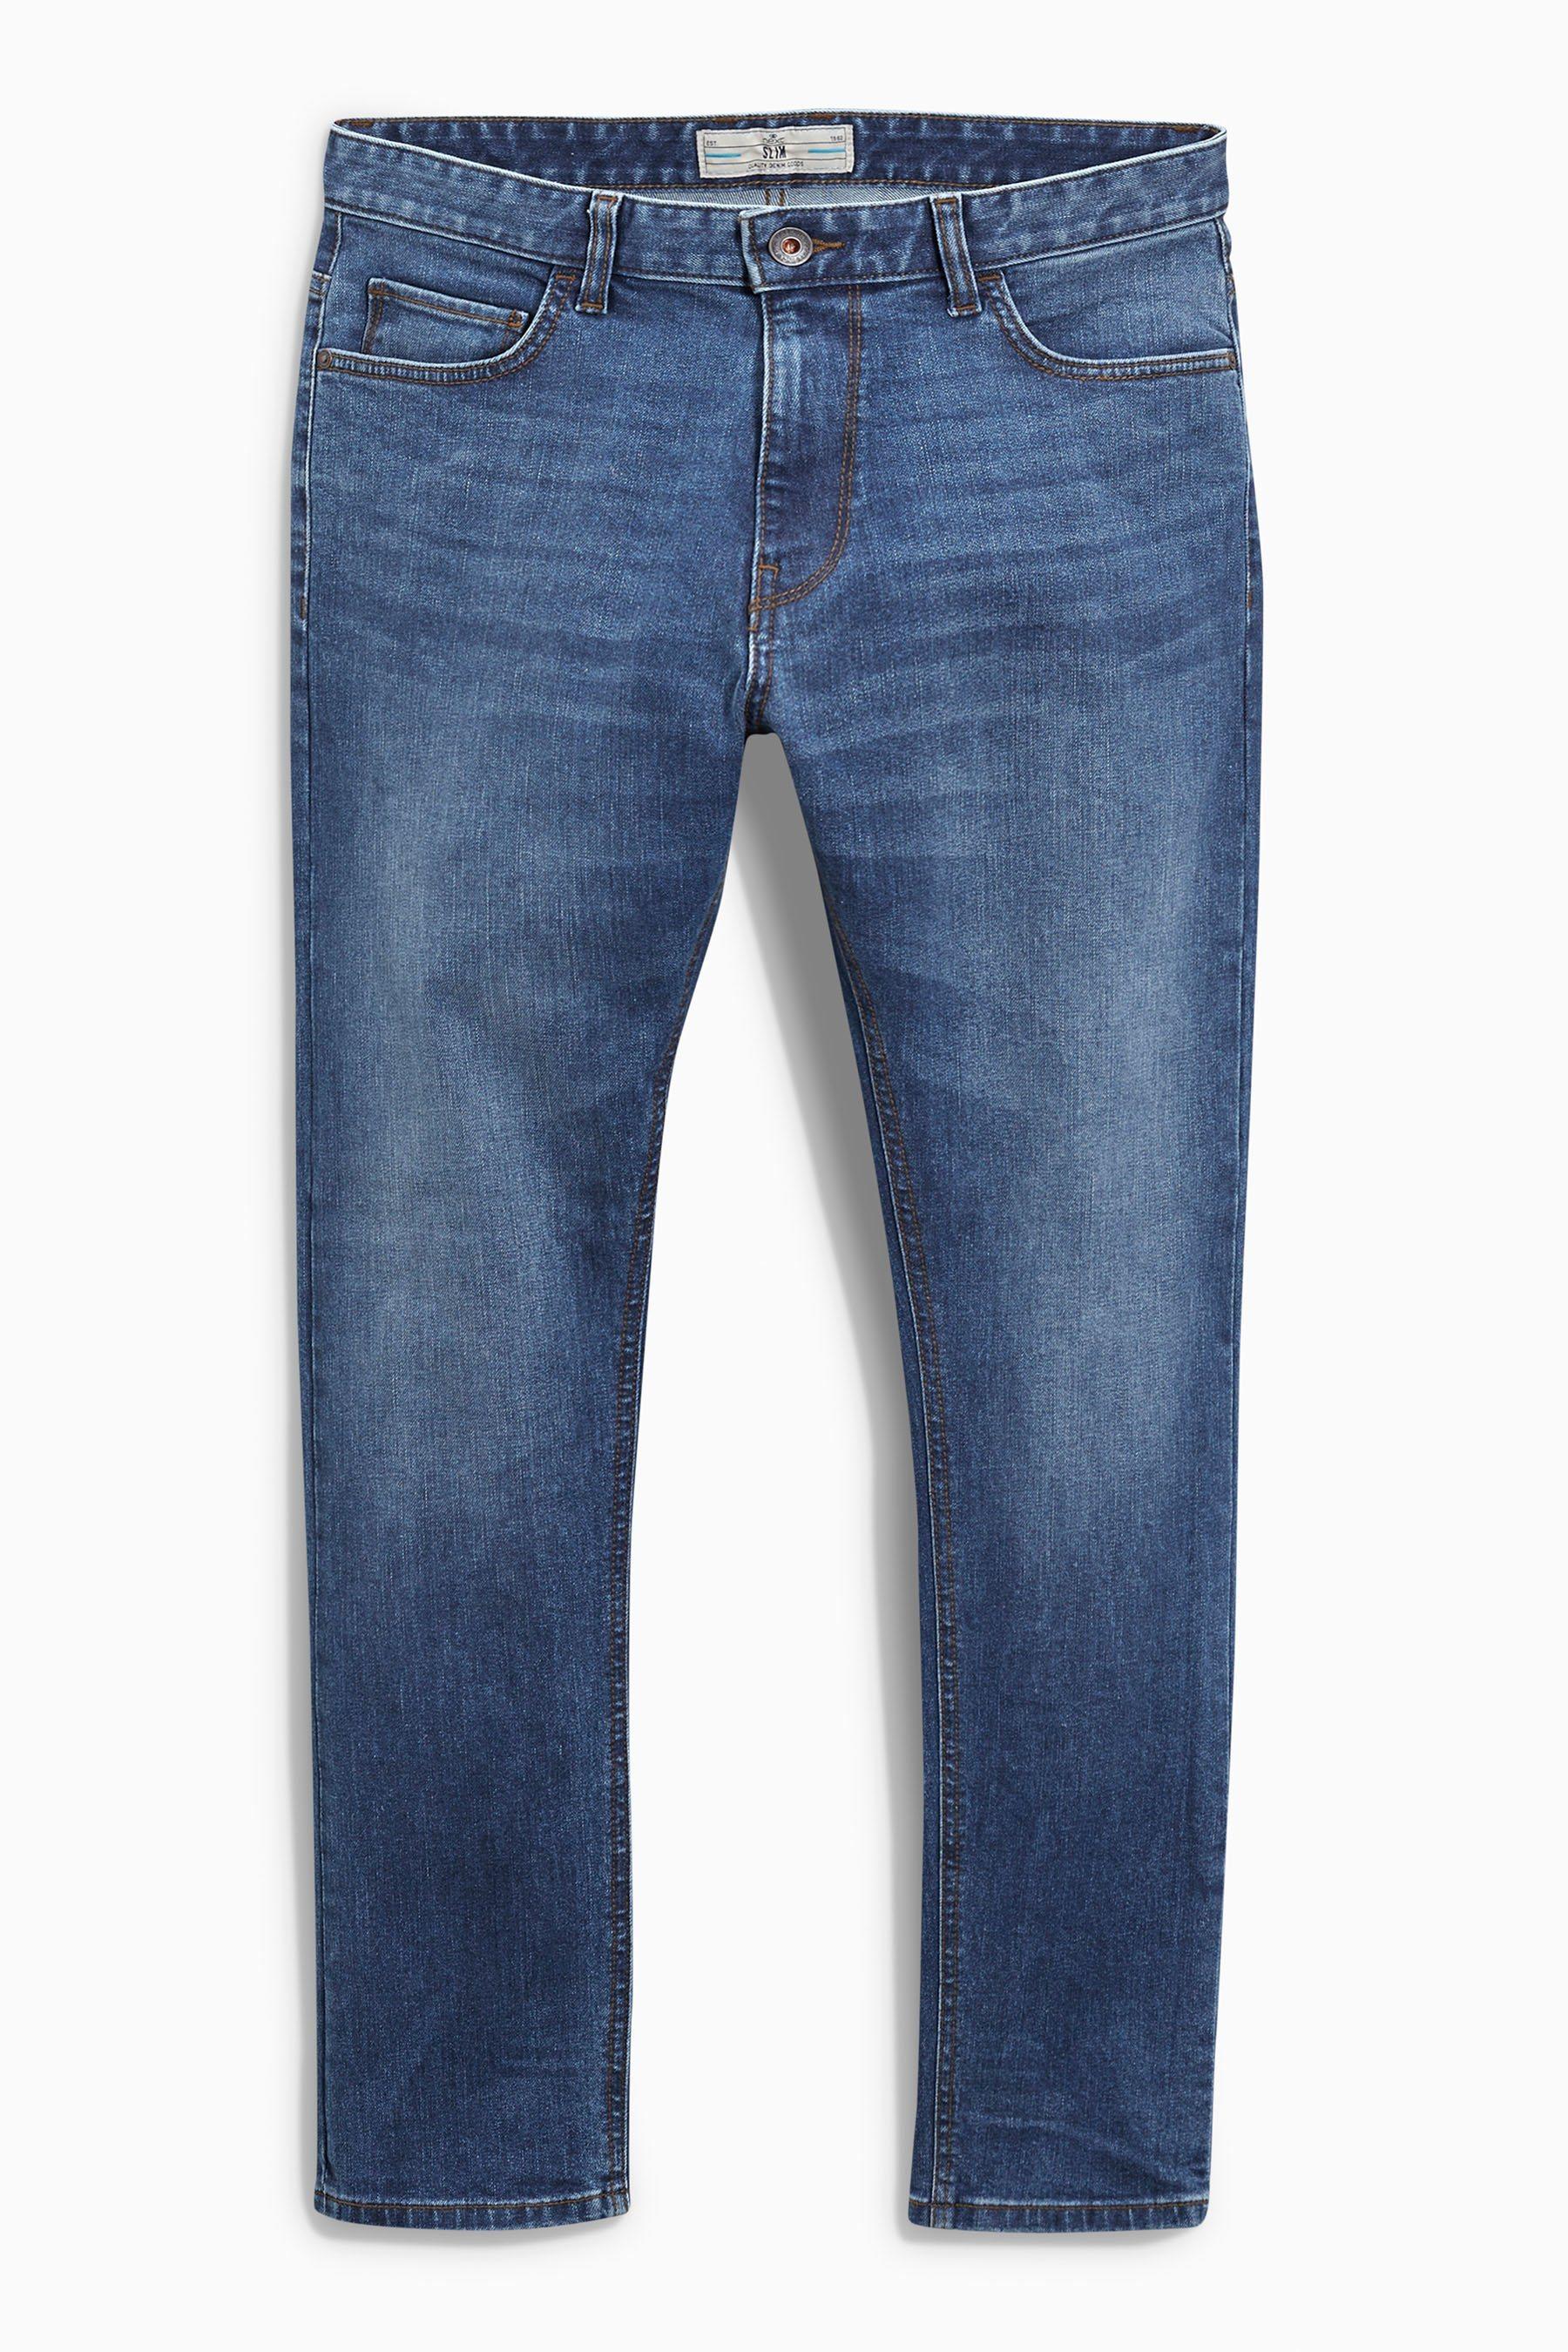 Next Slim-Fit Bright Blue Stretch-Jeans